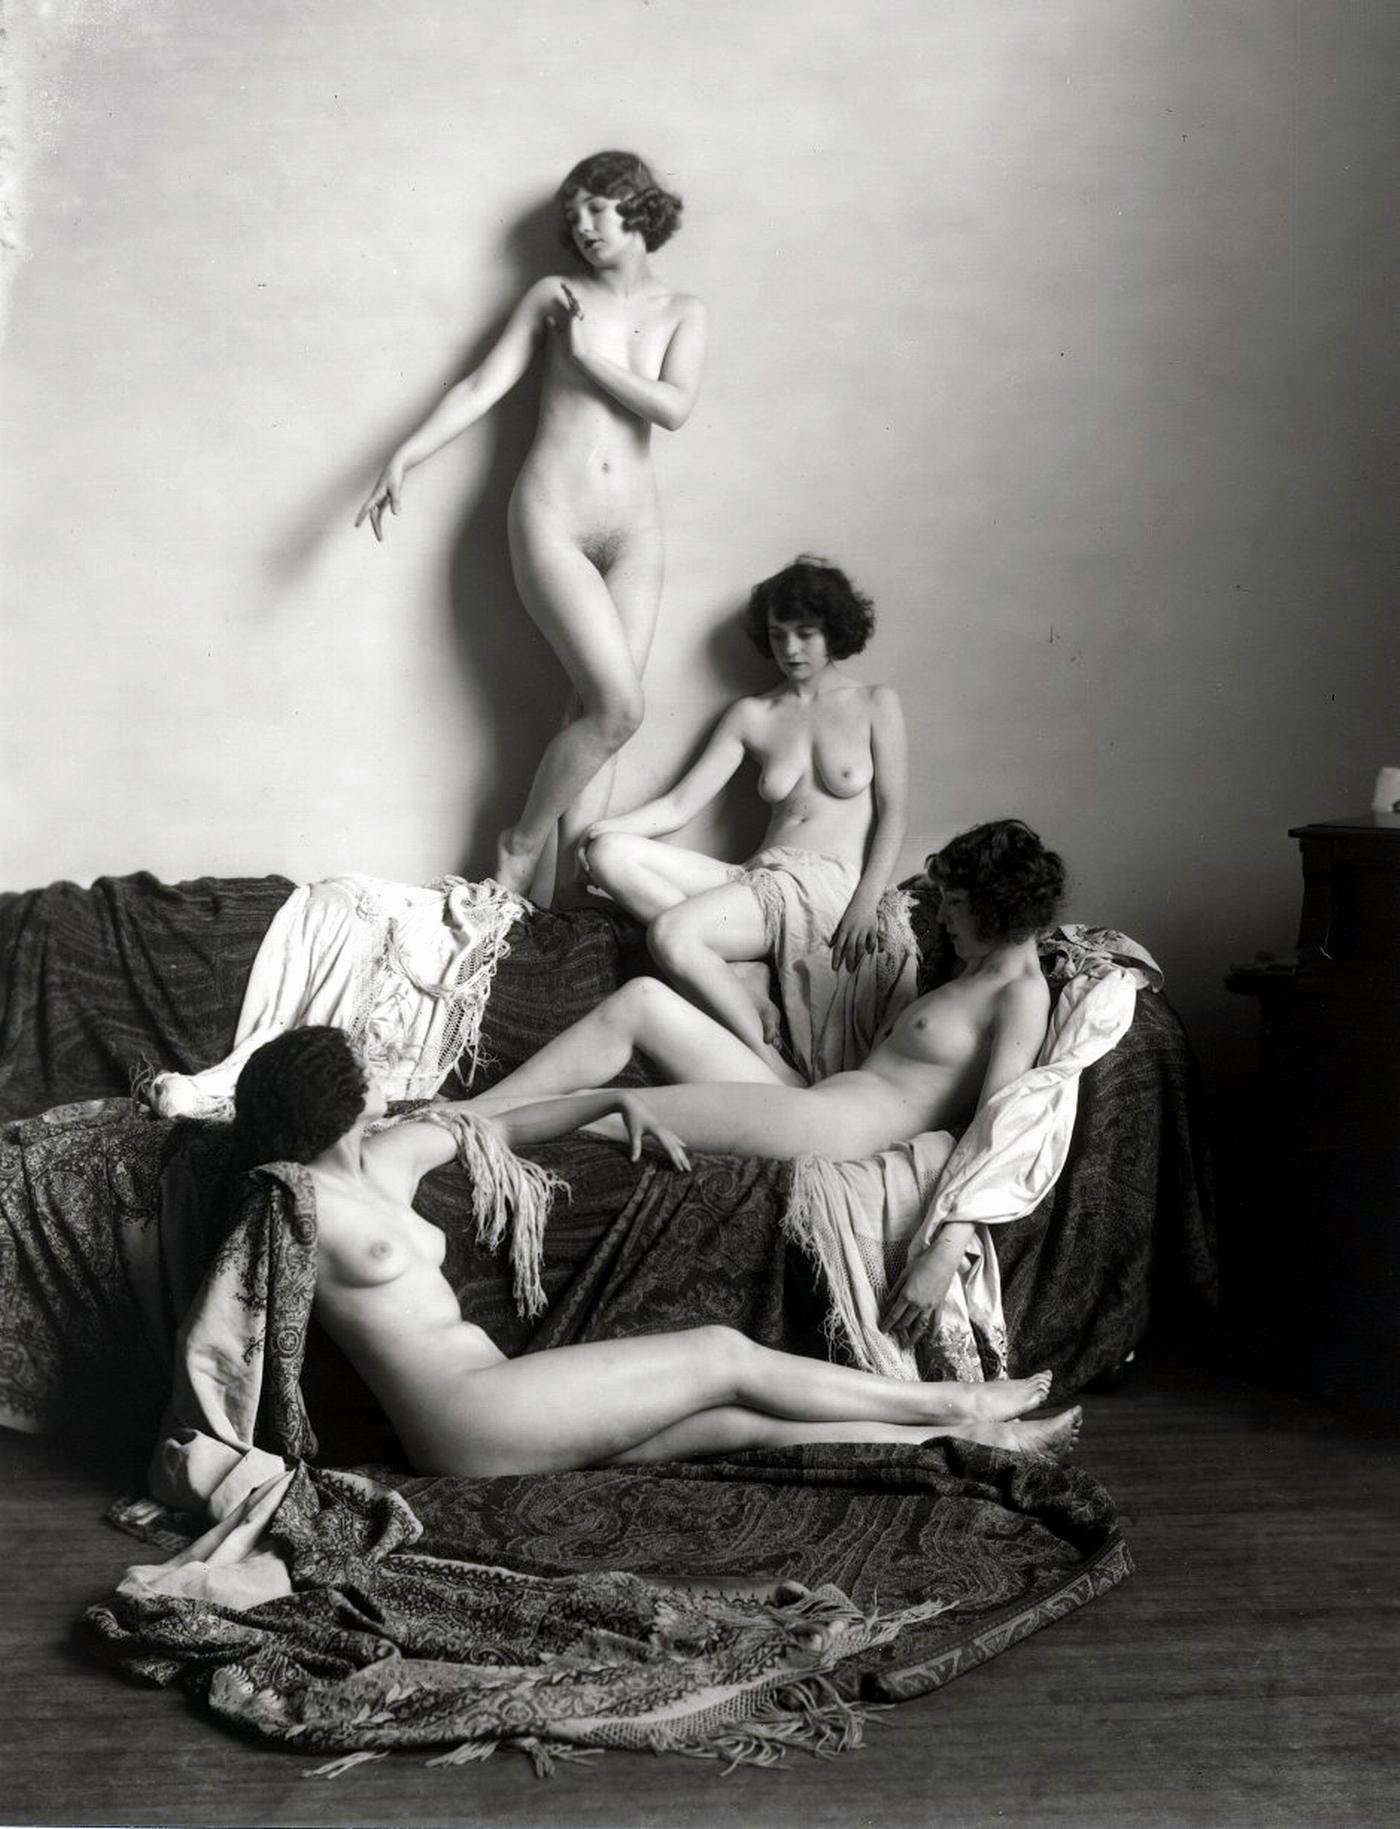 Секс фото 20 века 22 фотография